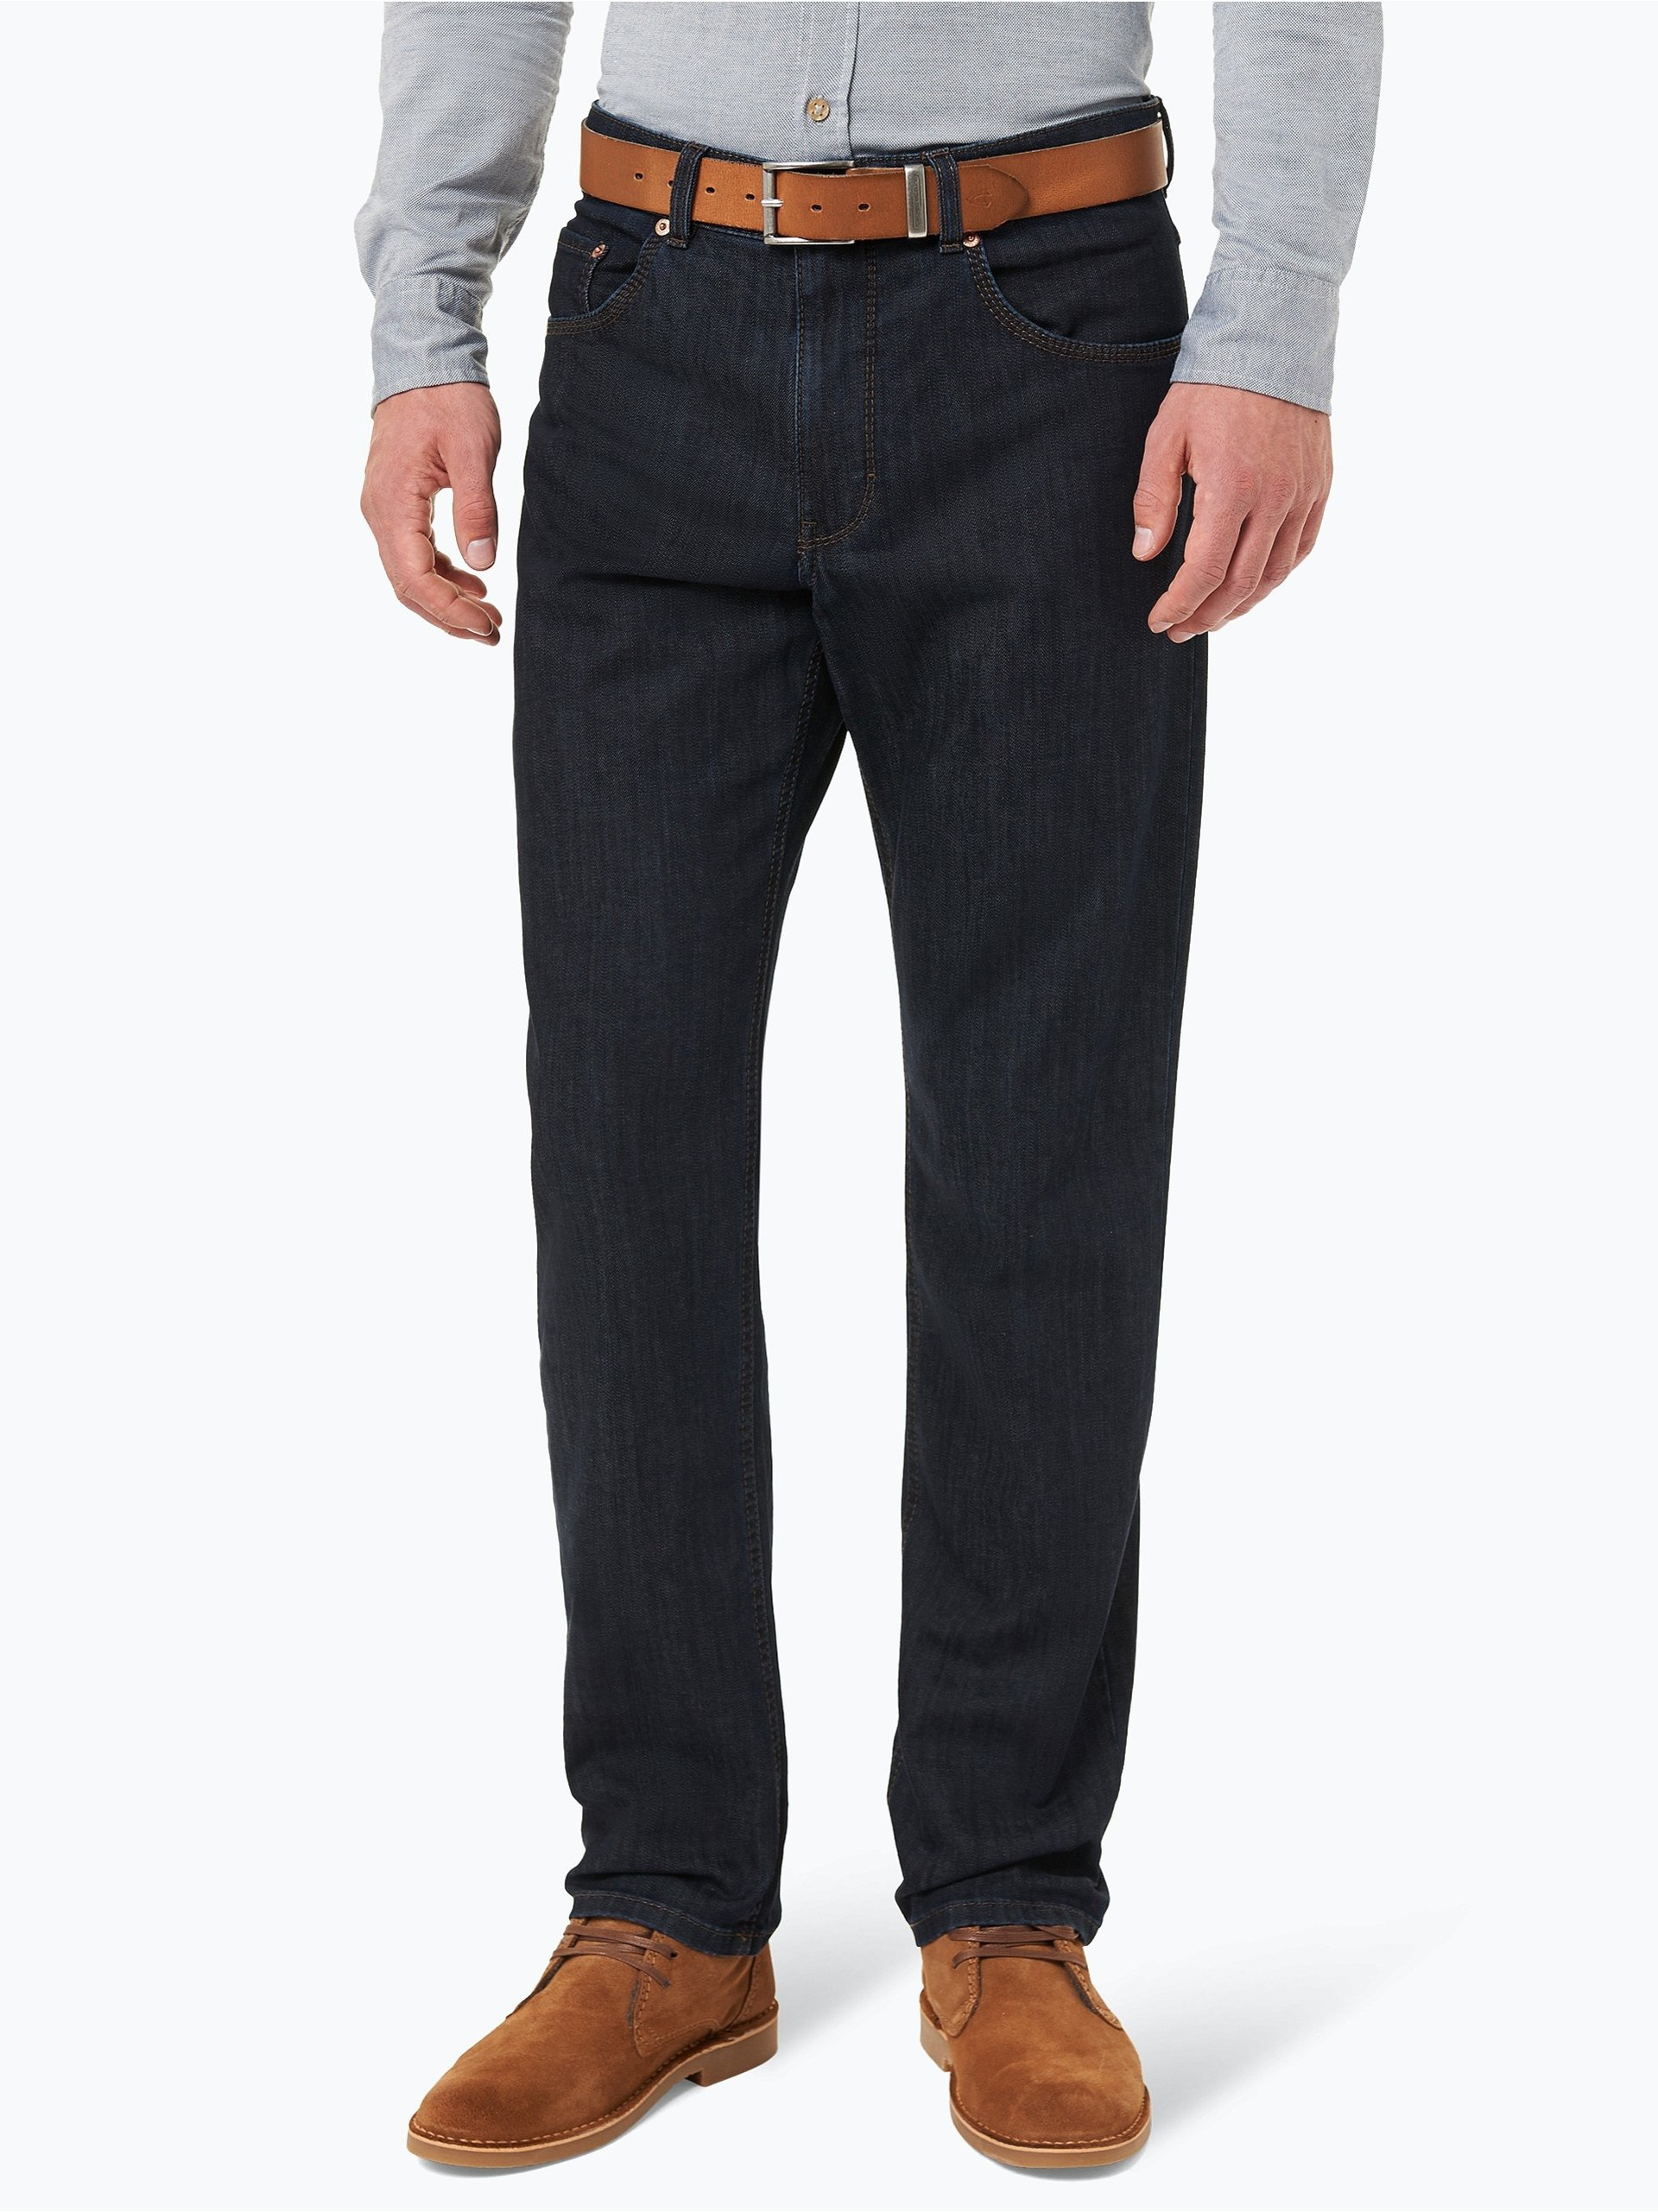 brax herren jeans cooper denim rinsed uni online kaufen. Black Bedroom Furniture Sets. Home Design Ideas